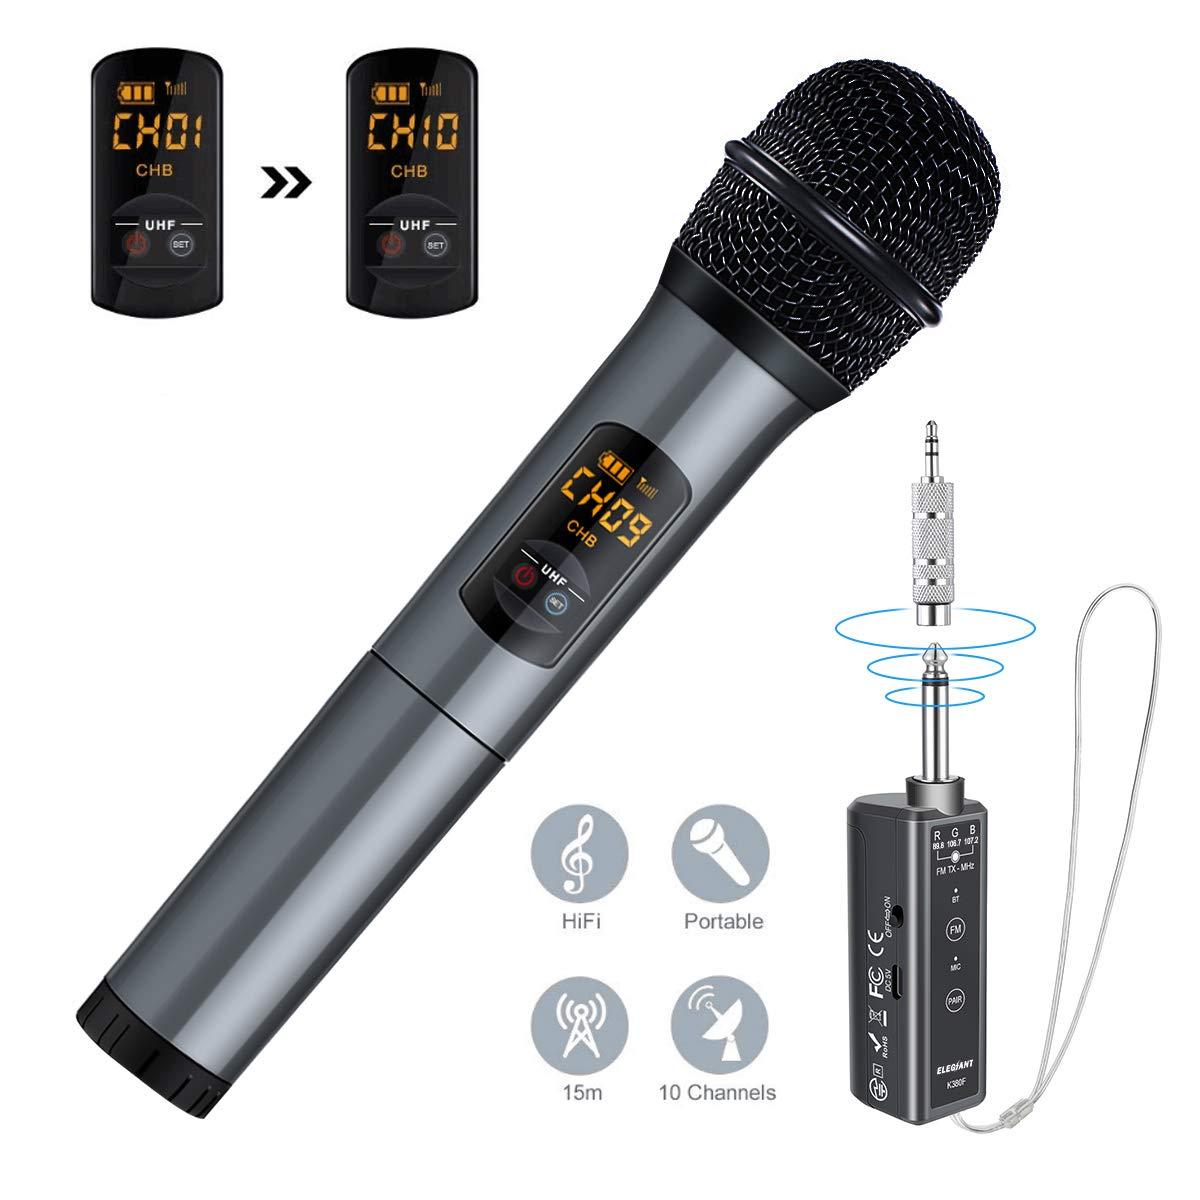 ELEGIANT Funkmikrofon, Kabelloses Mikrofon UHF mikrofon Bluetooth mit Empfänger drahtlos Microphone Karaoke Handmikrofon über 15m Geschenk